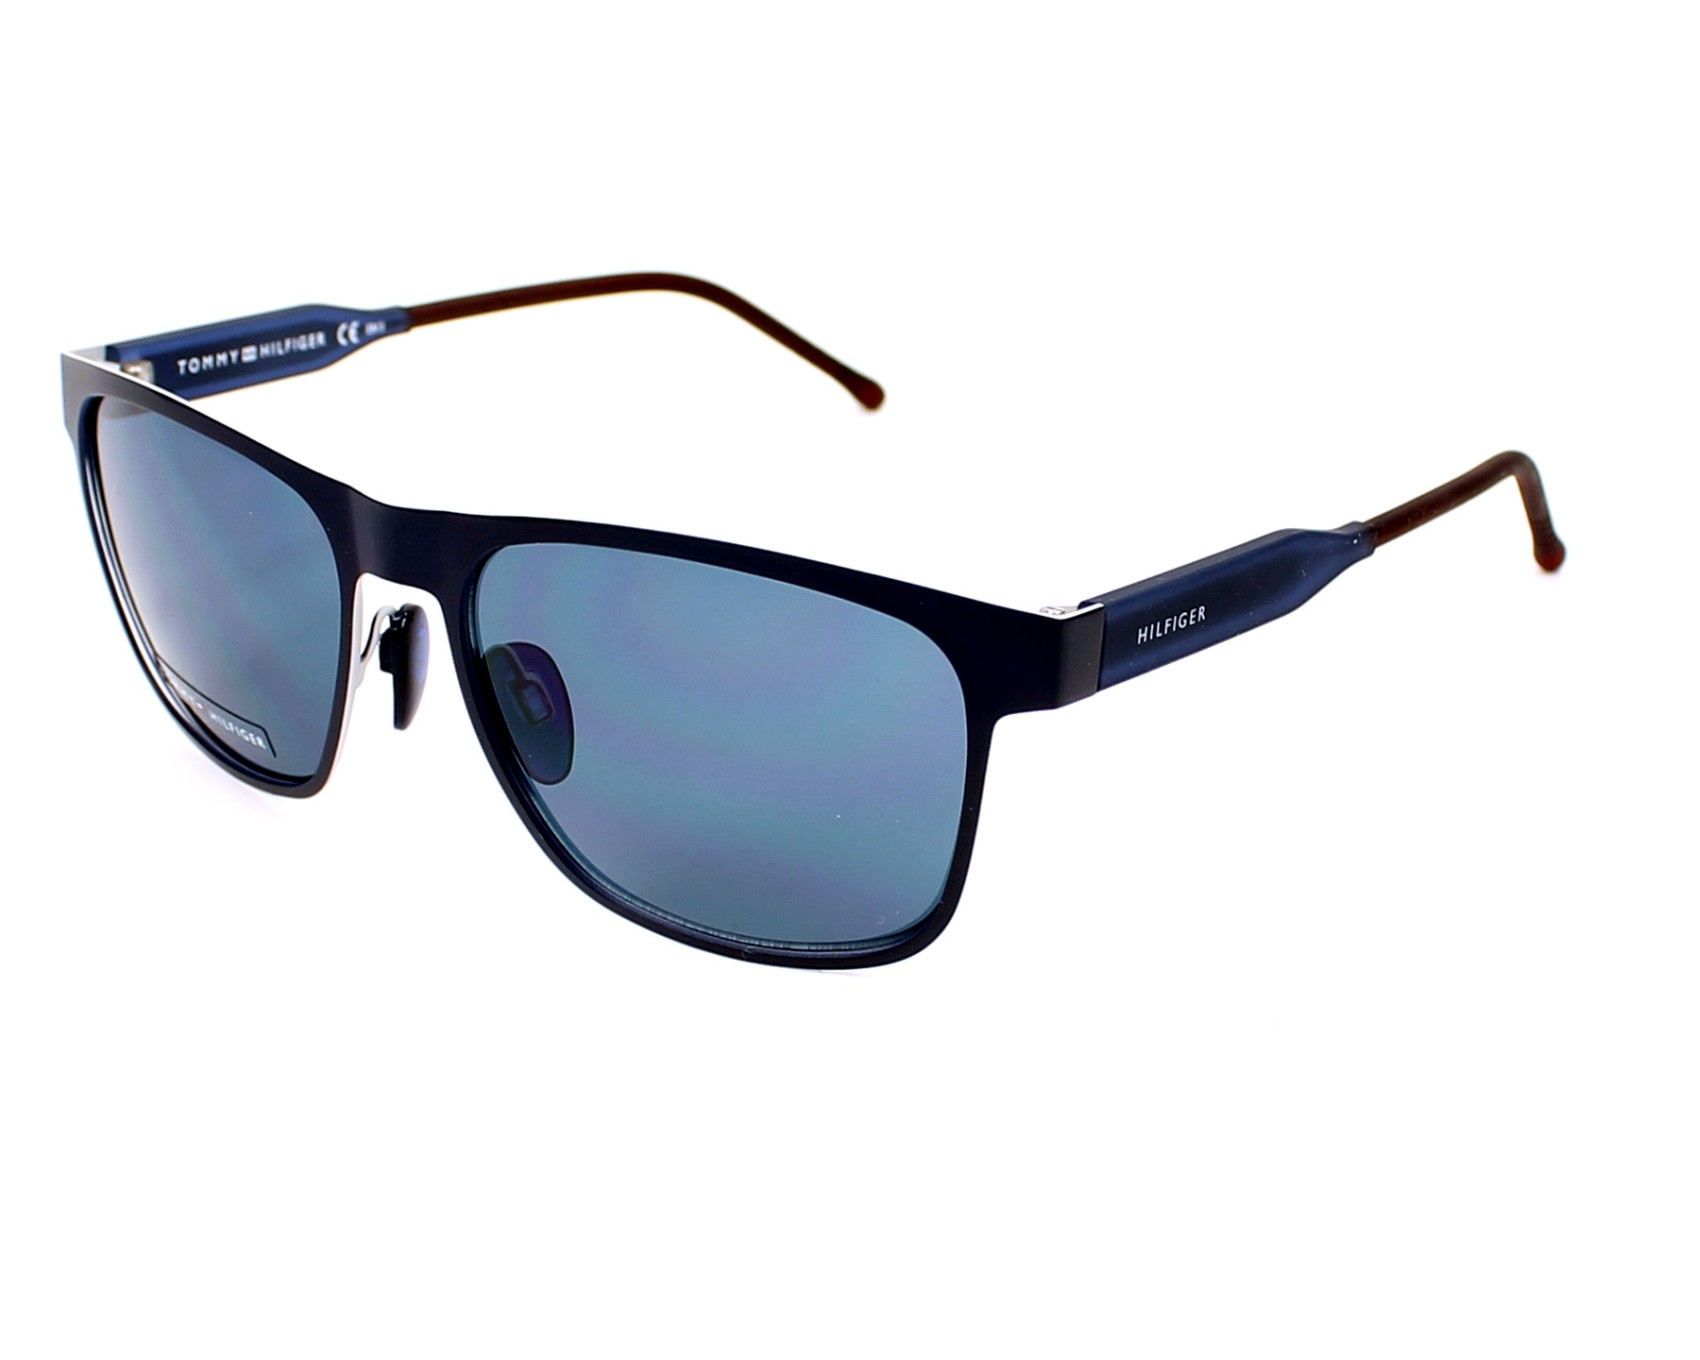 lunettes de soleil tommy hilfiger th 1394 s r19 8f bleu pas cher visionet. Black Bedroom Furniture Sets. Home Design Ideas